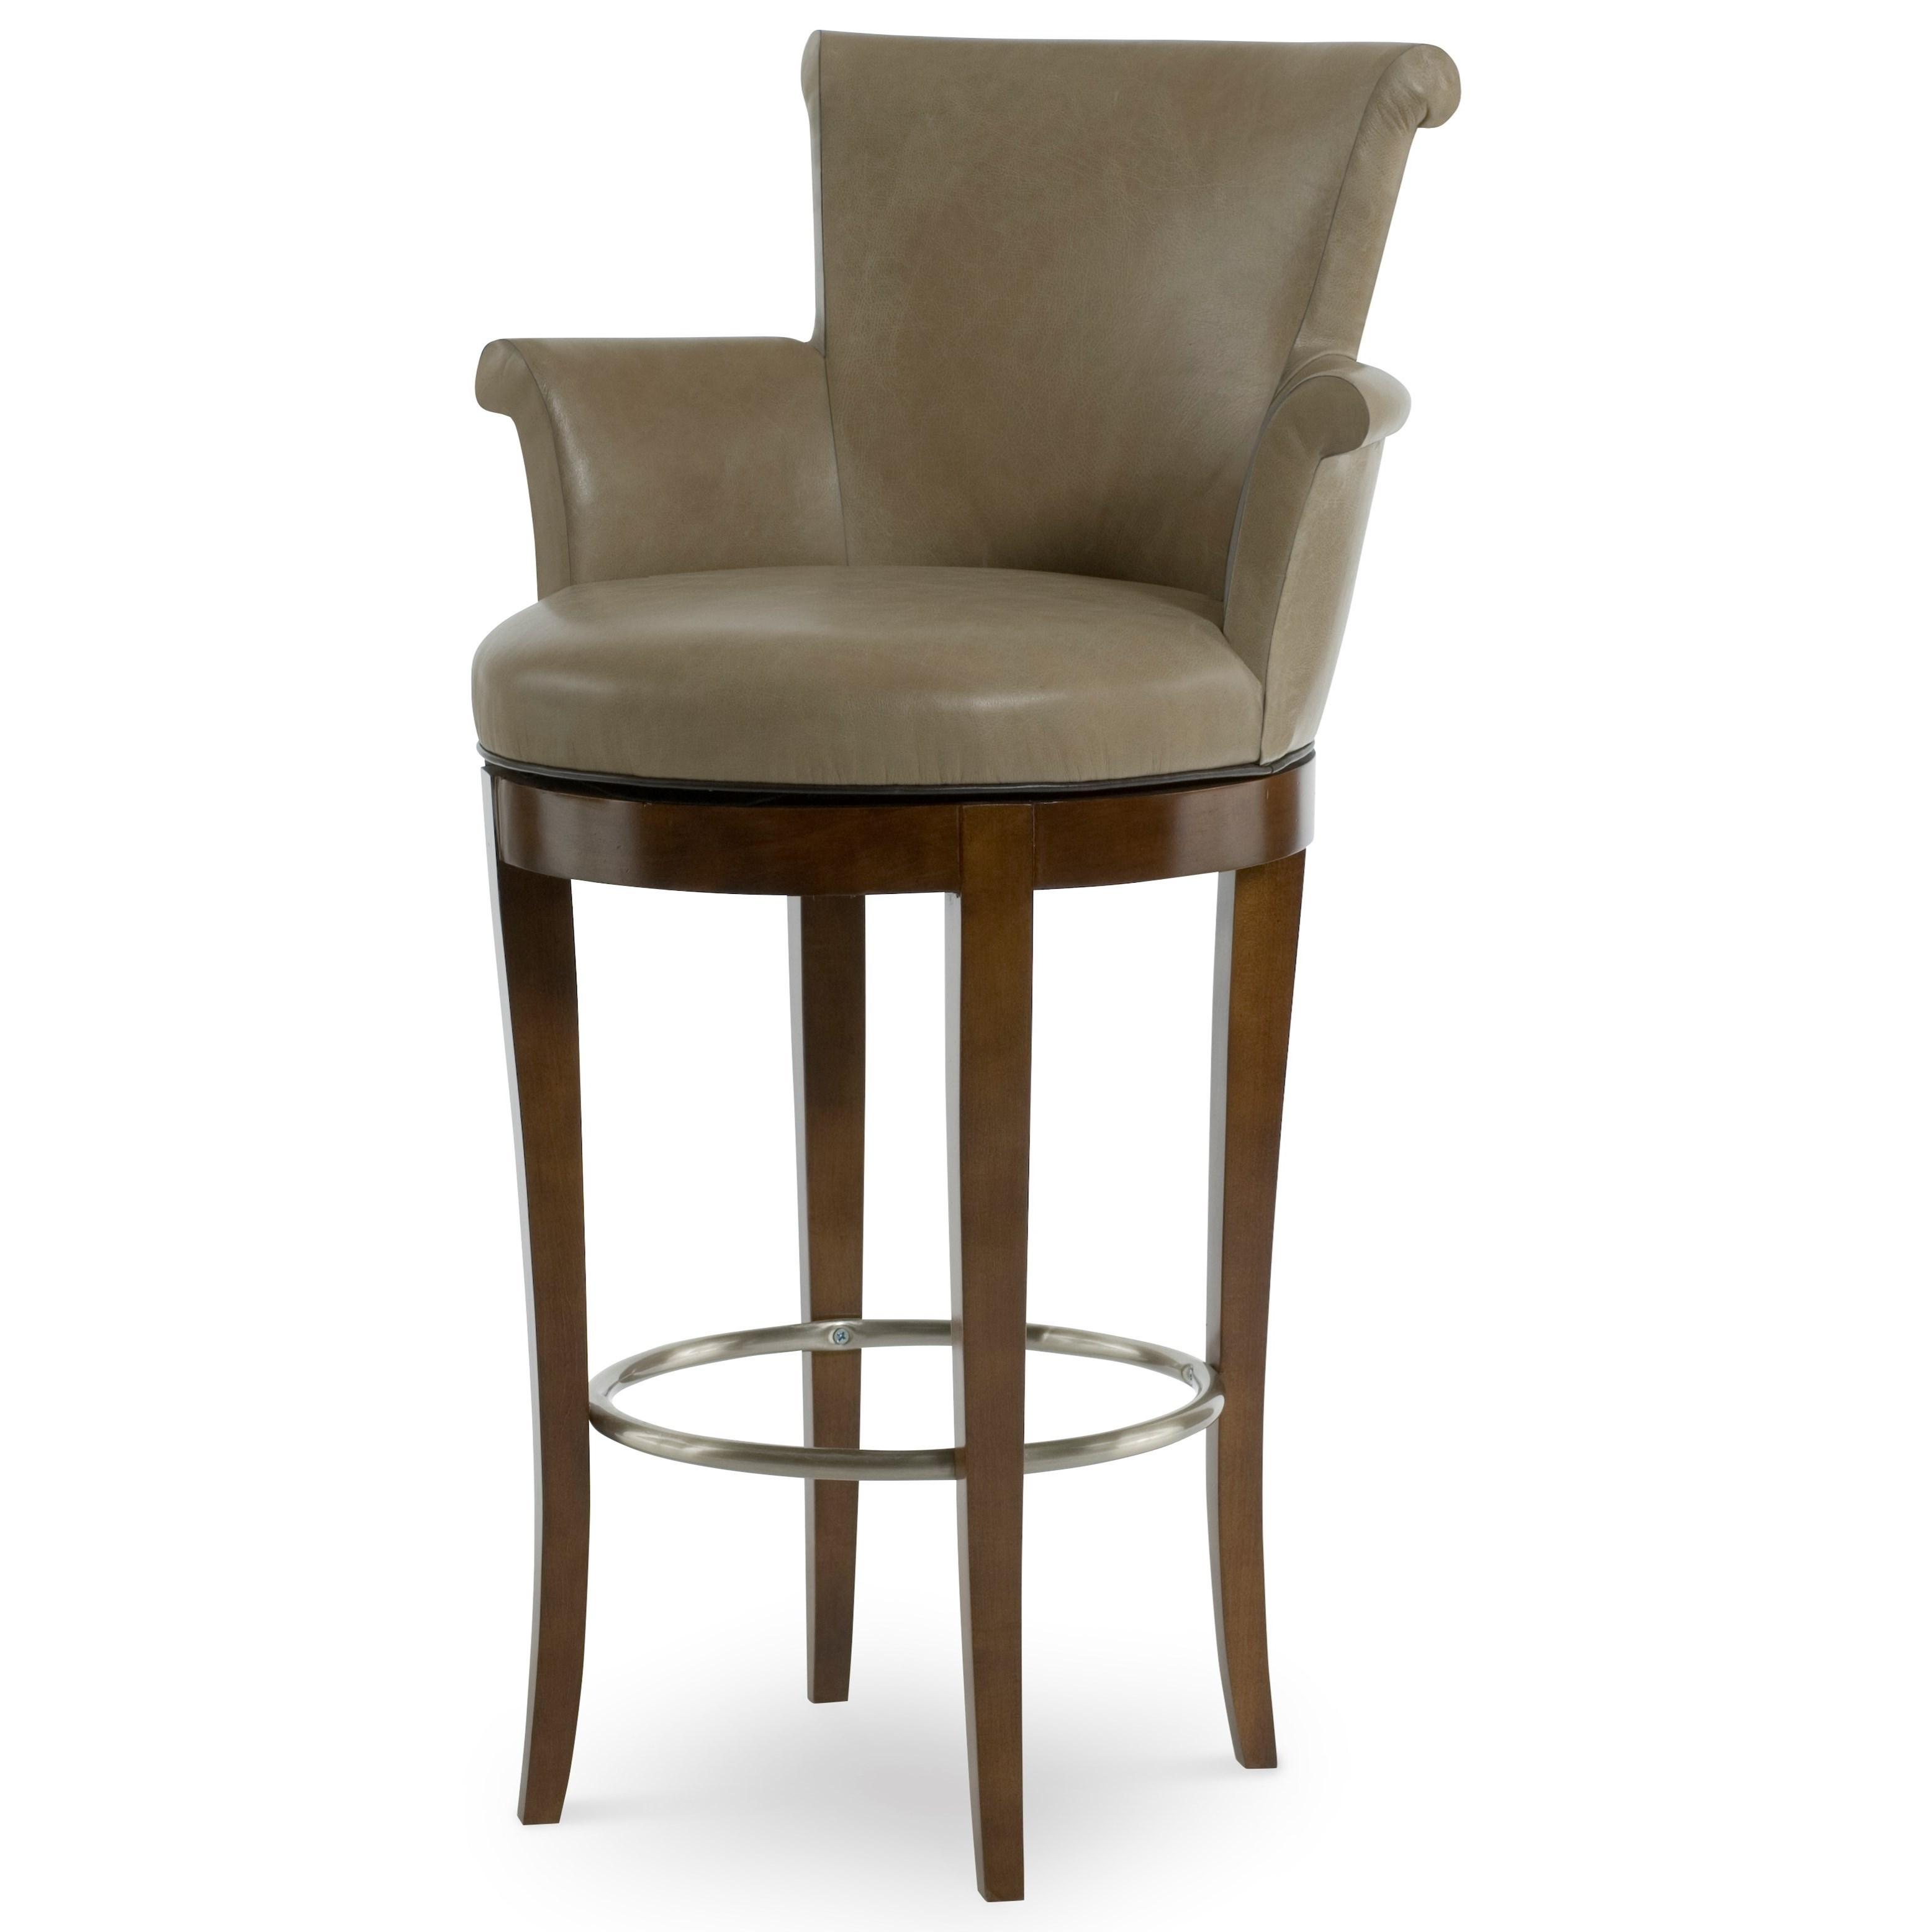 3800B-3 Scroll Swivel Bar Stool by Century at Sprintz Furniture